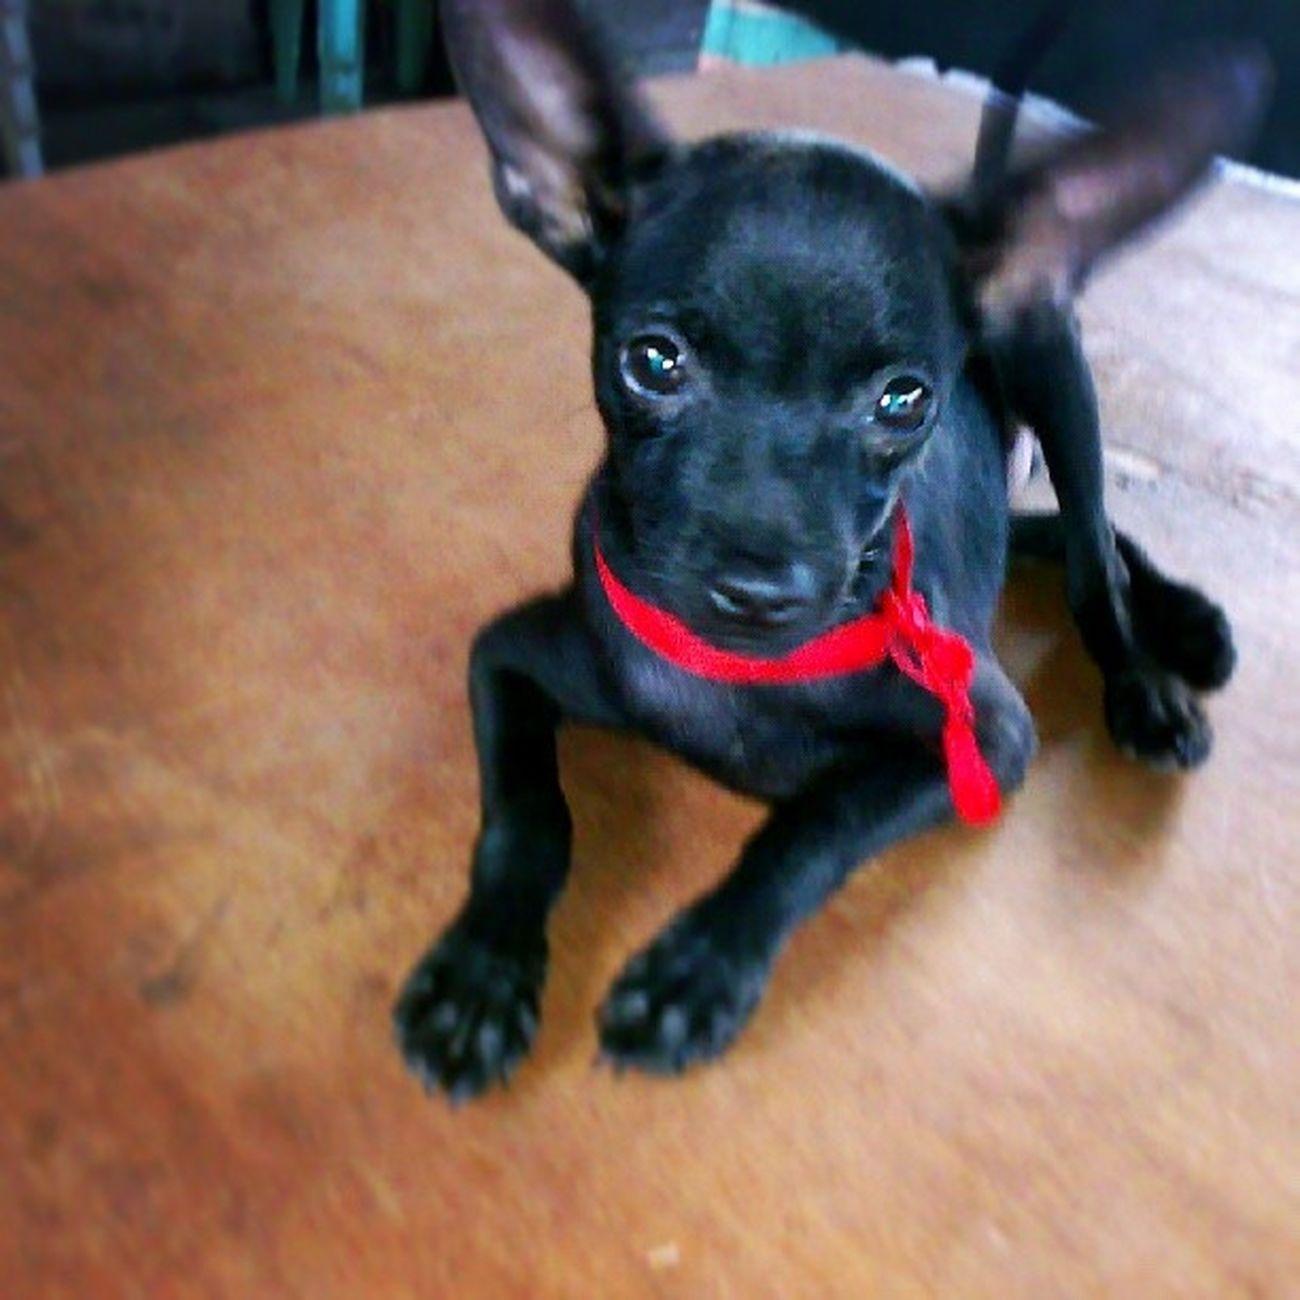 This is my Minipincher Puppy Tiny ....